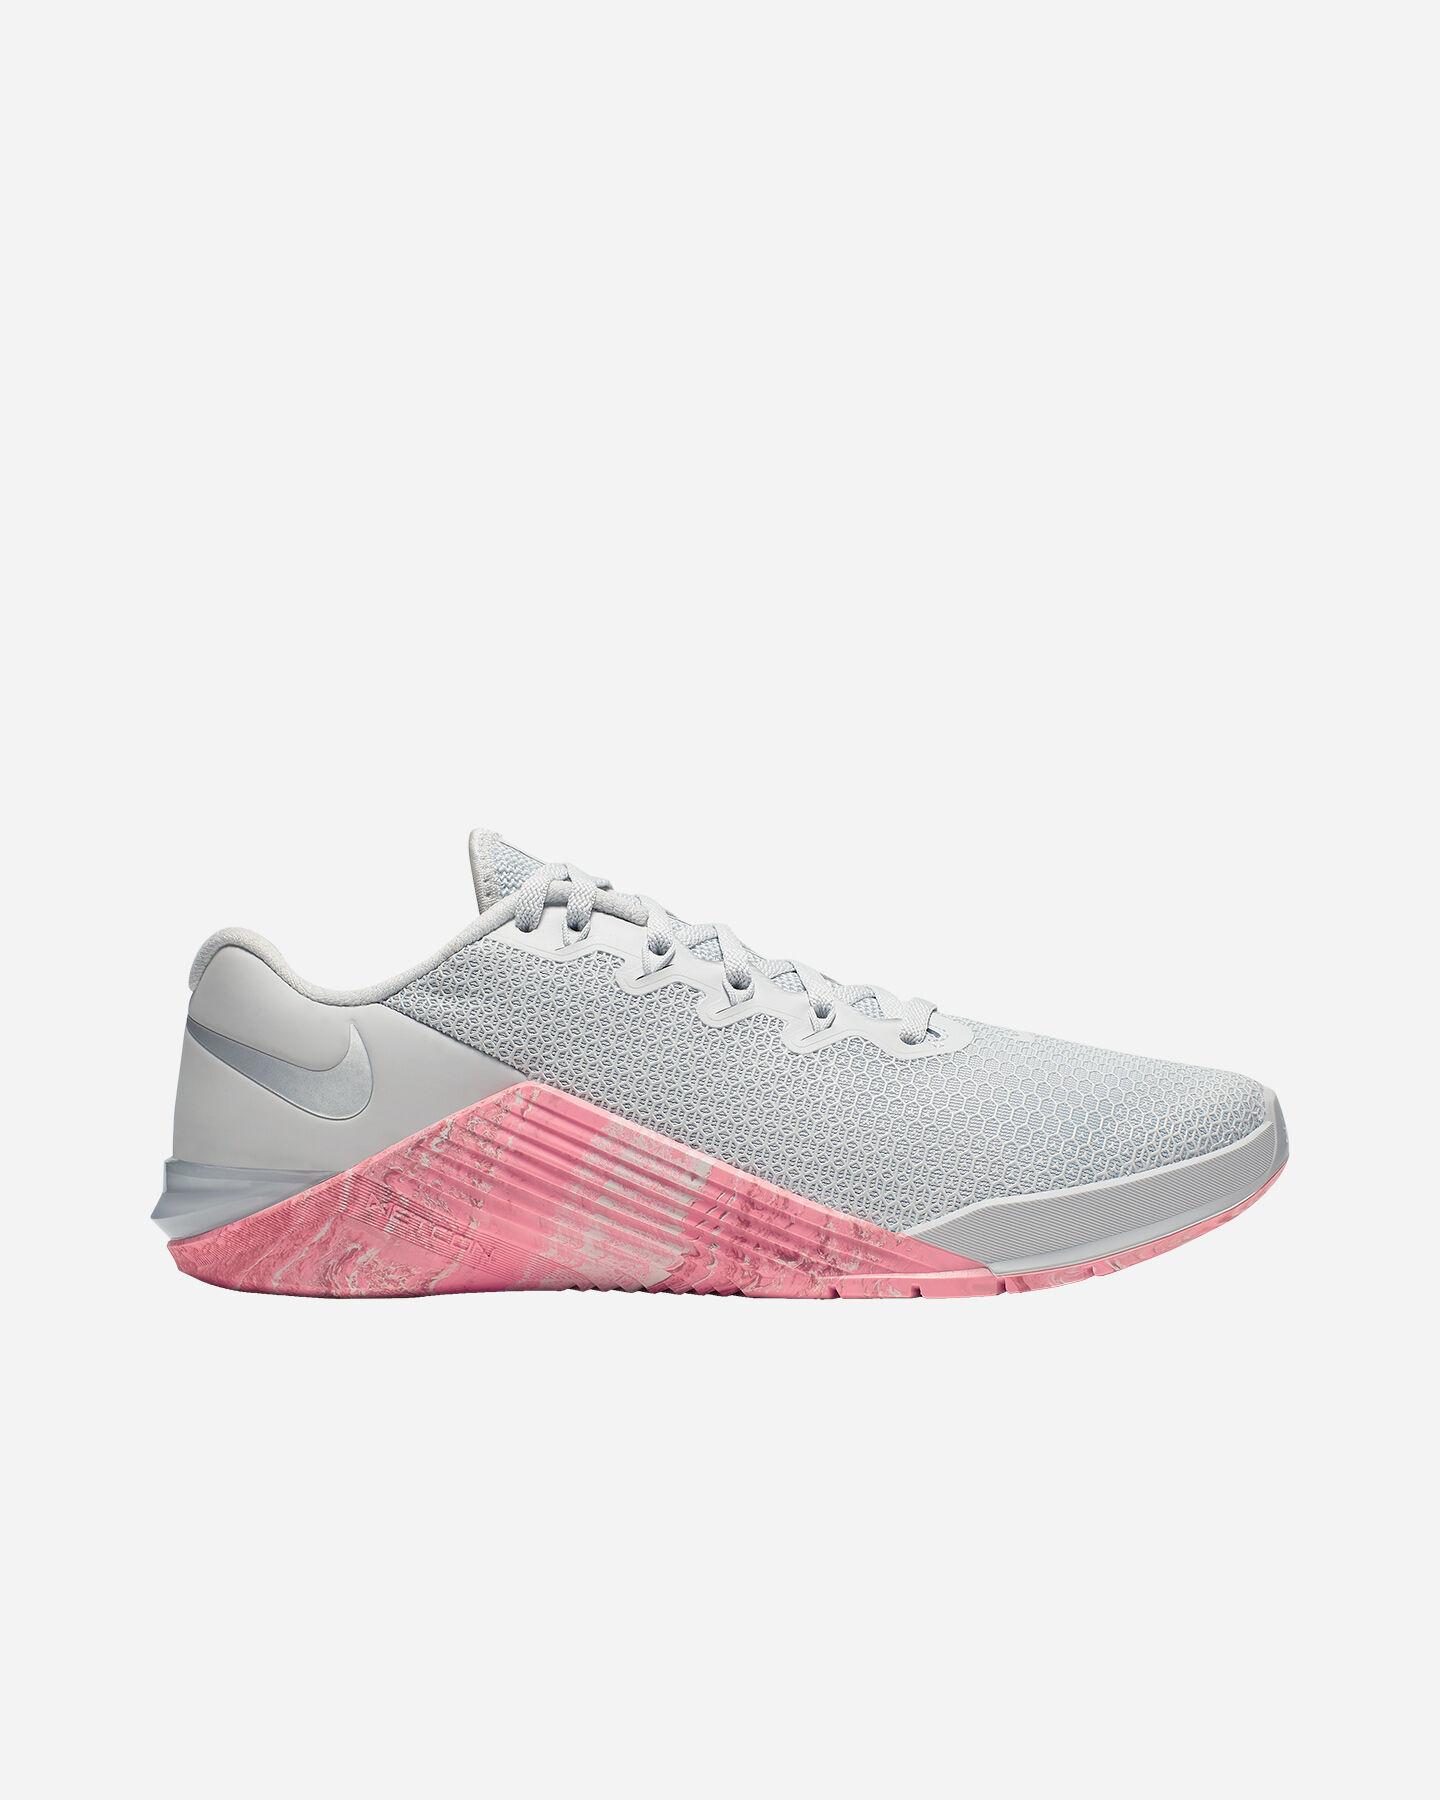 Scarpe Sportive Nike Metcon 5 W AO2982 004 | Cisalfa Sport